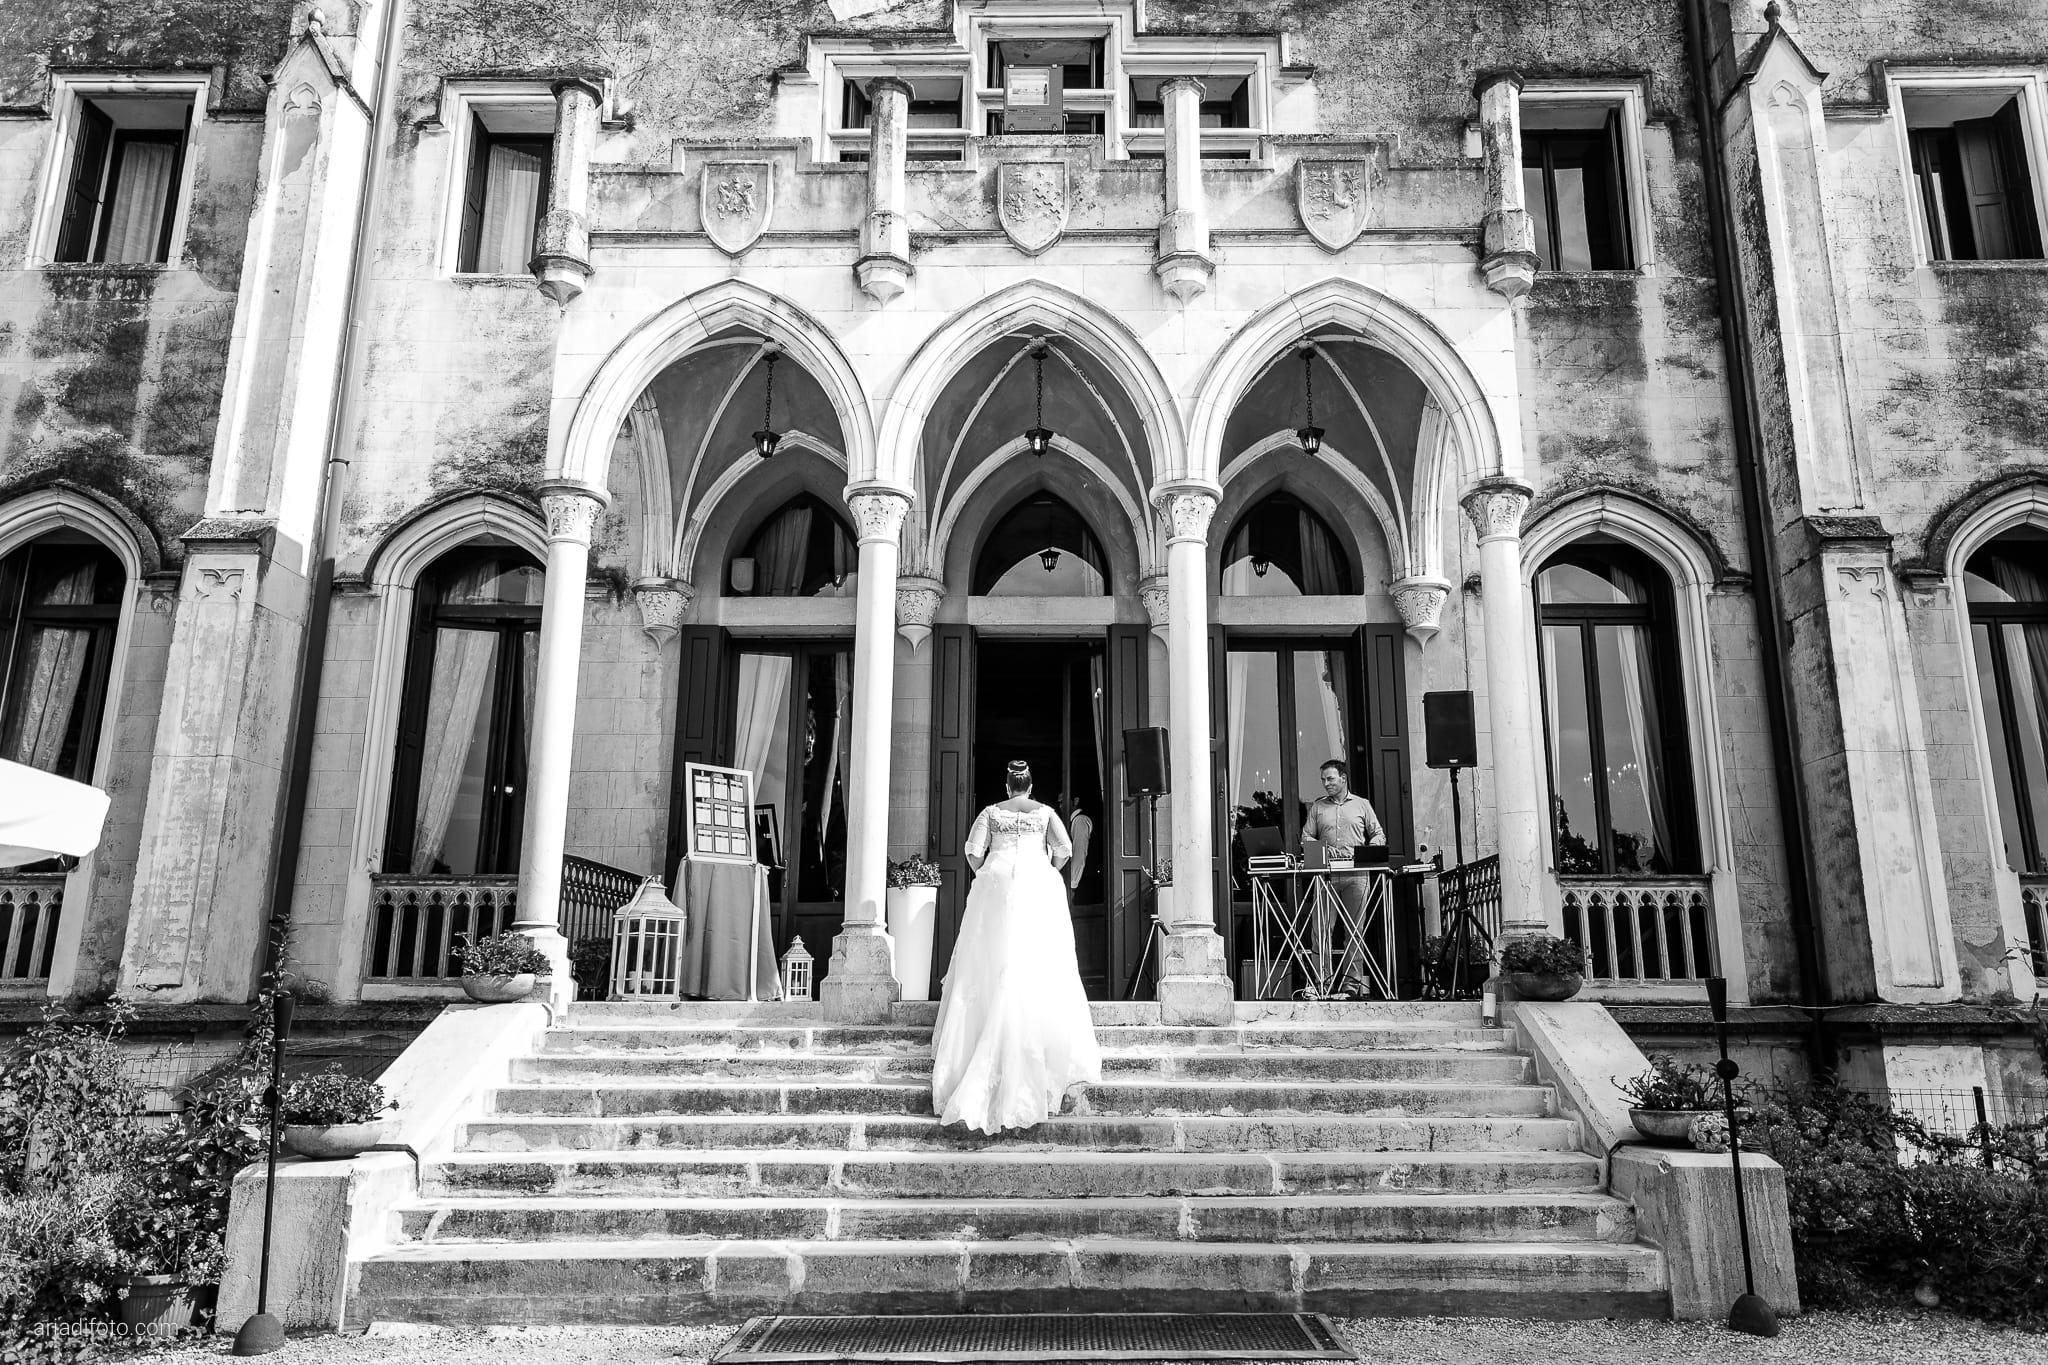 Eleonora Andrea Matrimonio Castello Papadopoli Giol San Polo Piave Treviso ricevimento